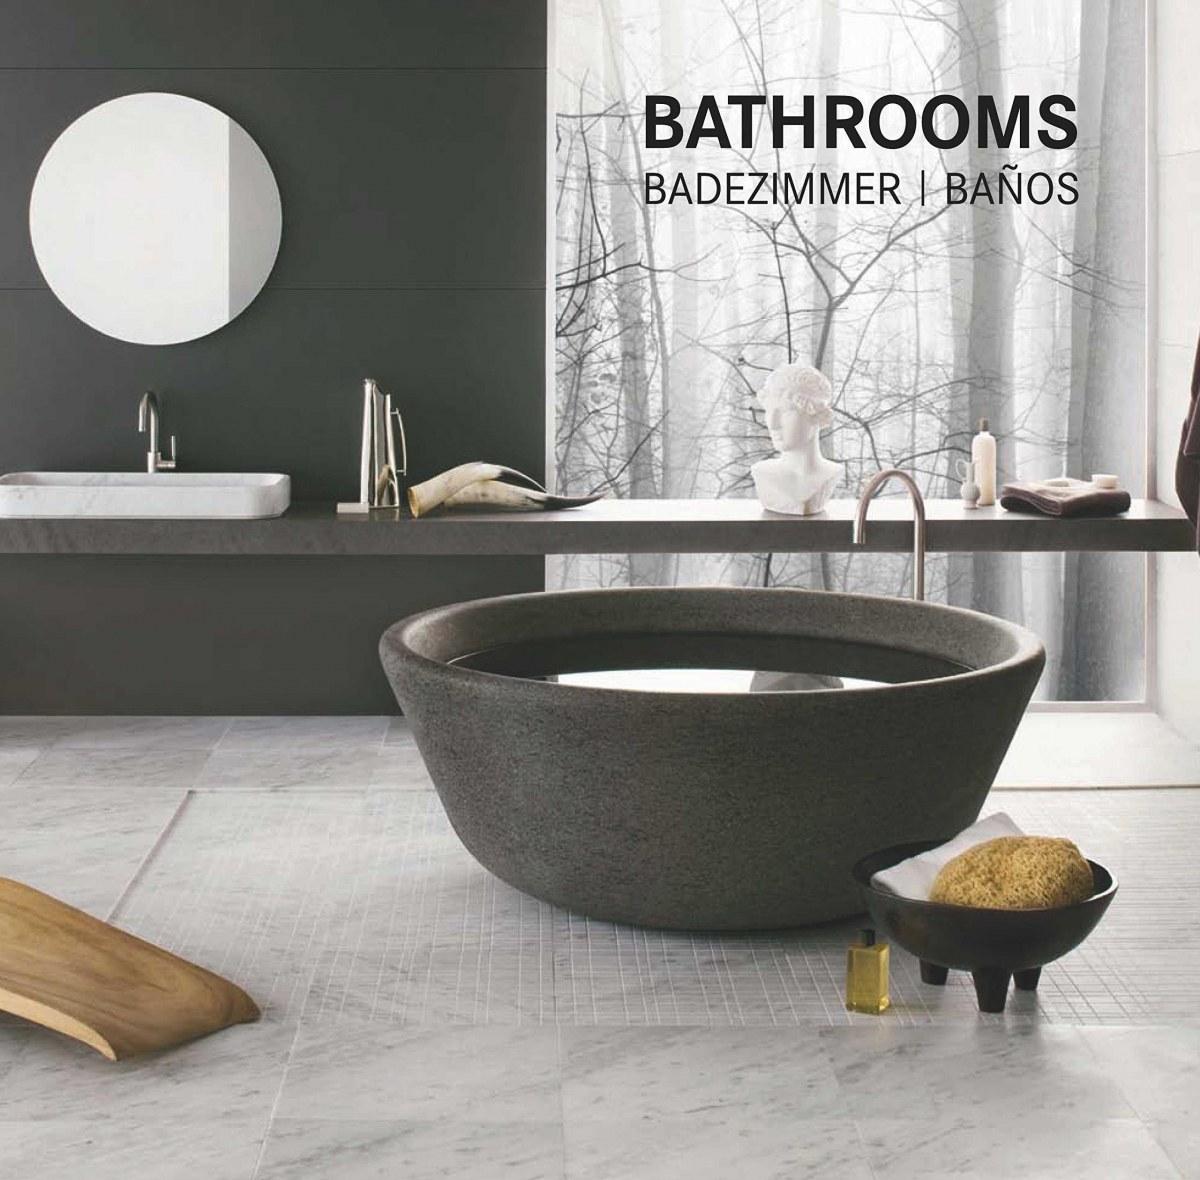 BATHROOMS 9783864075834